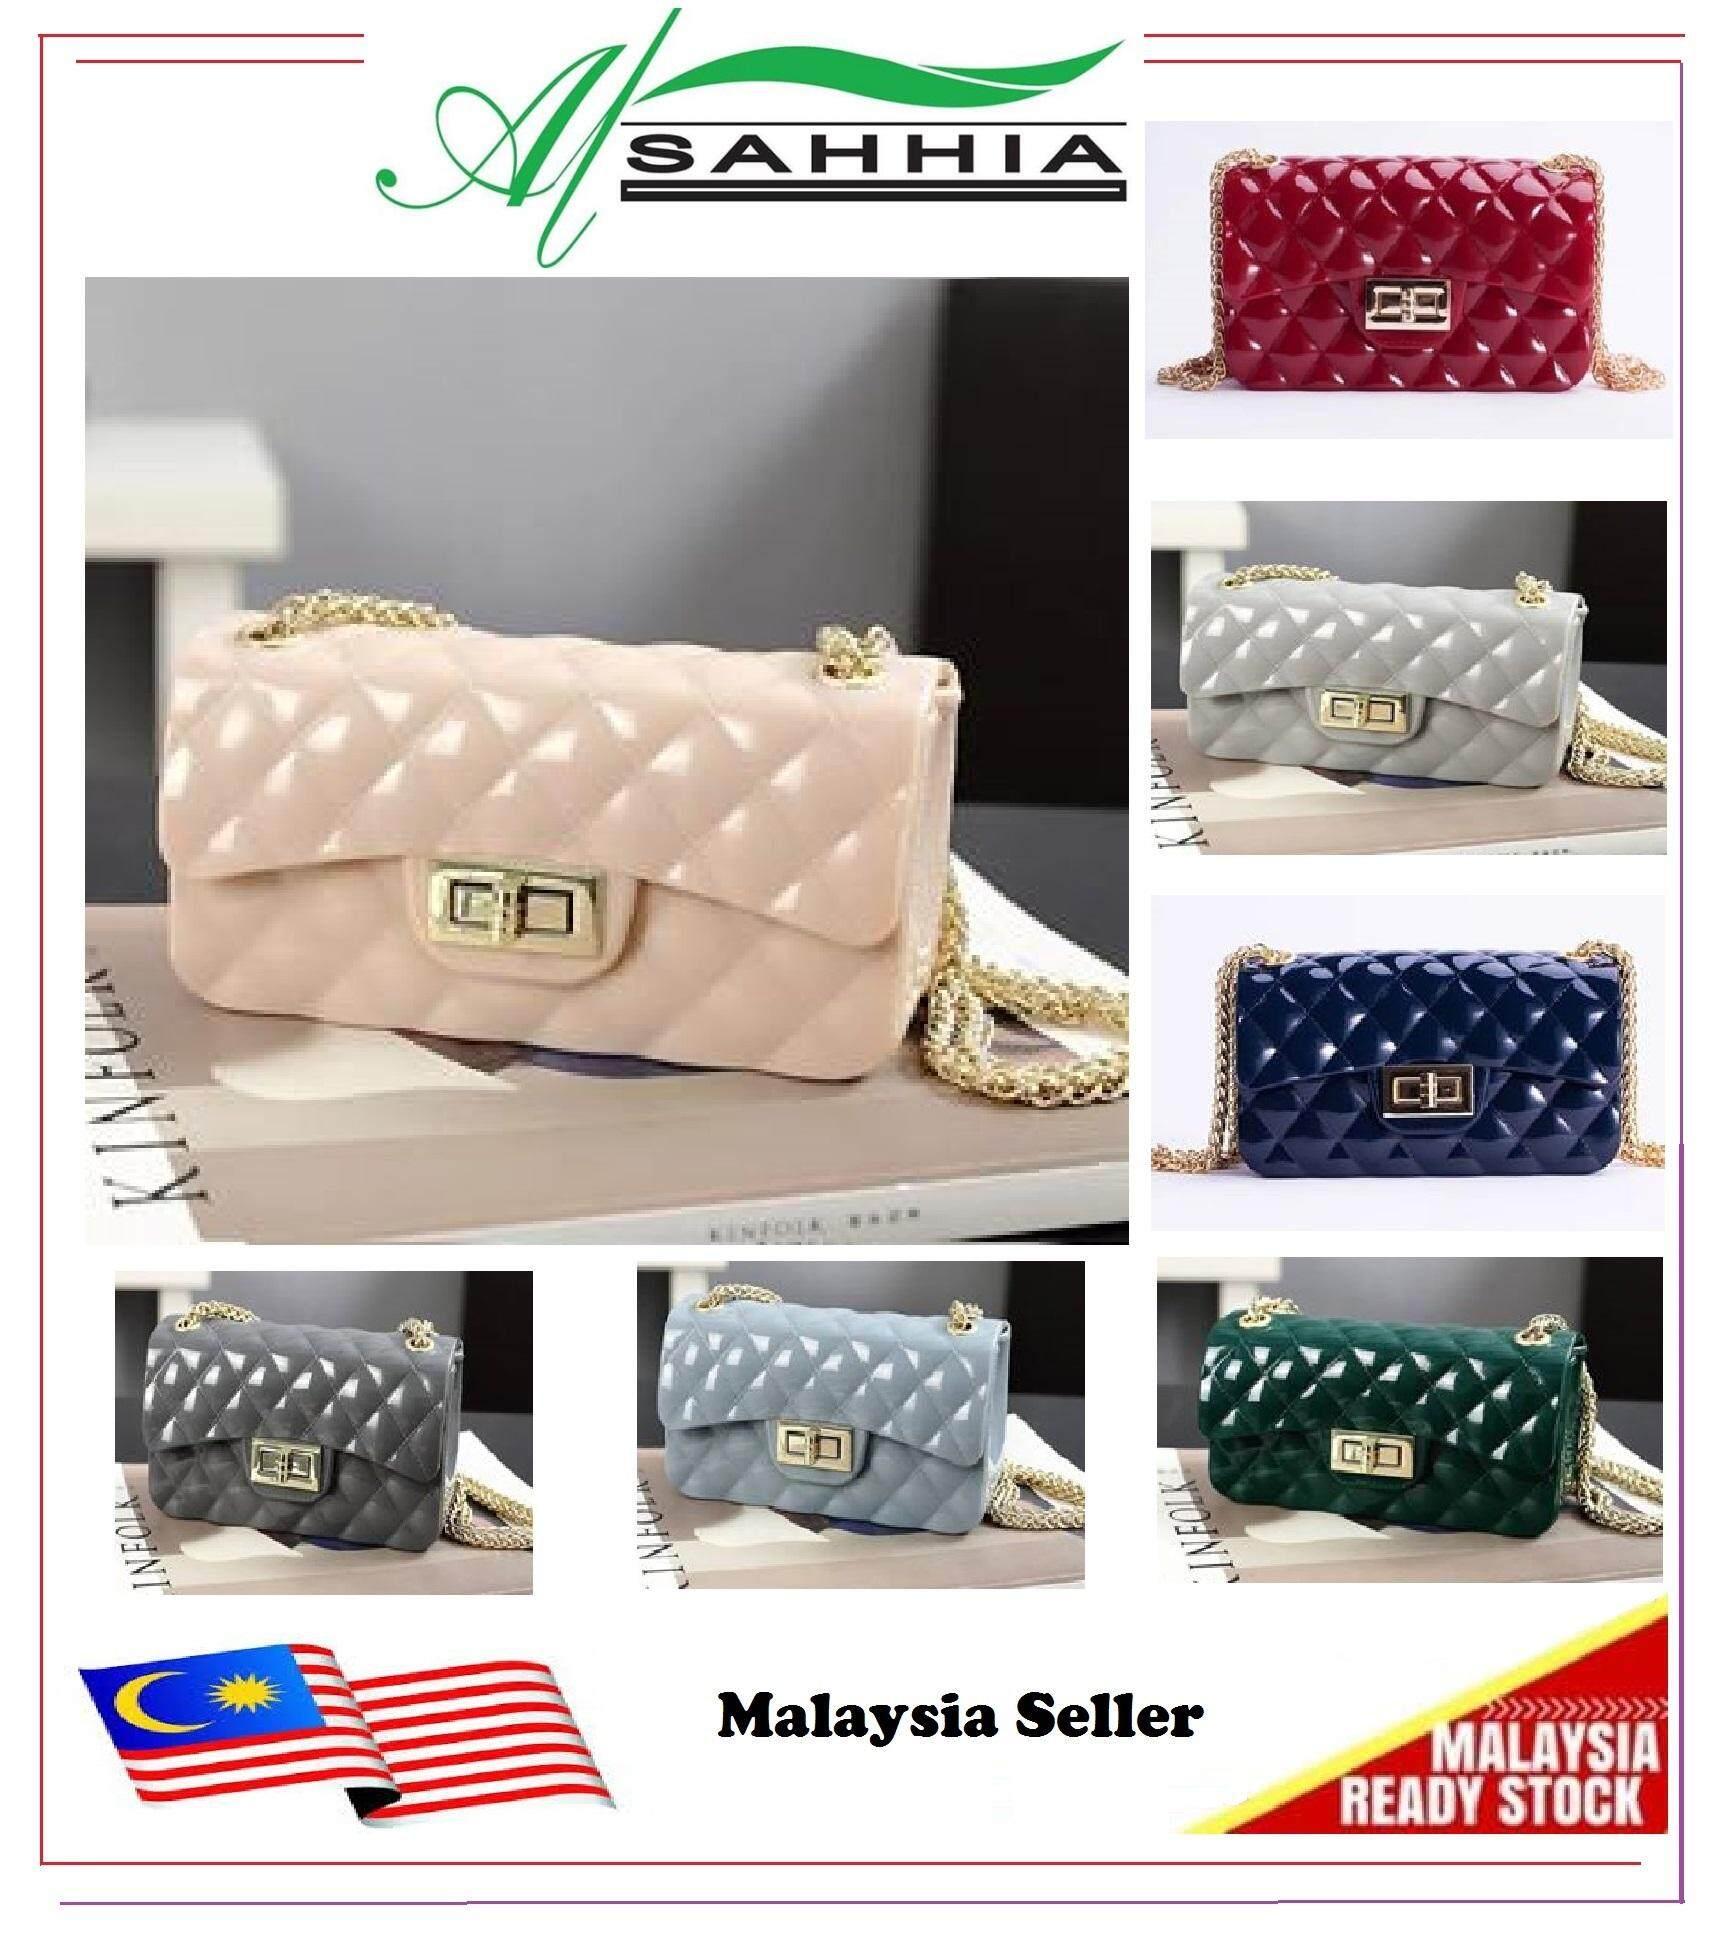 da8c7ab6a1cc Al Sahhia Ready Stock Jelly Bag Bags Sling Bag Shoulder Bag Begs Fashion Bag